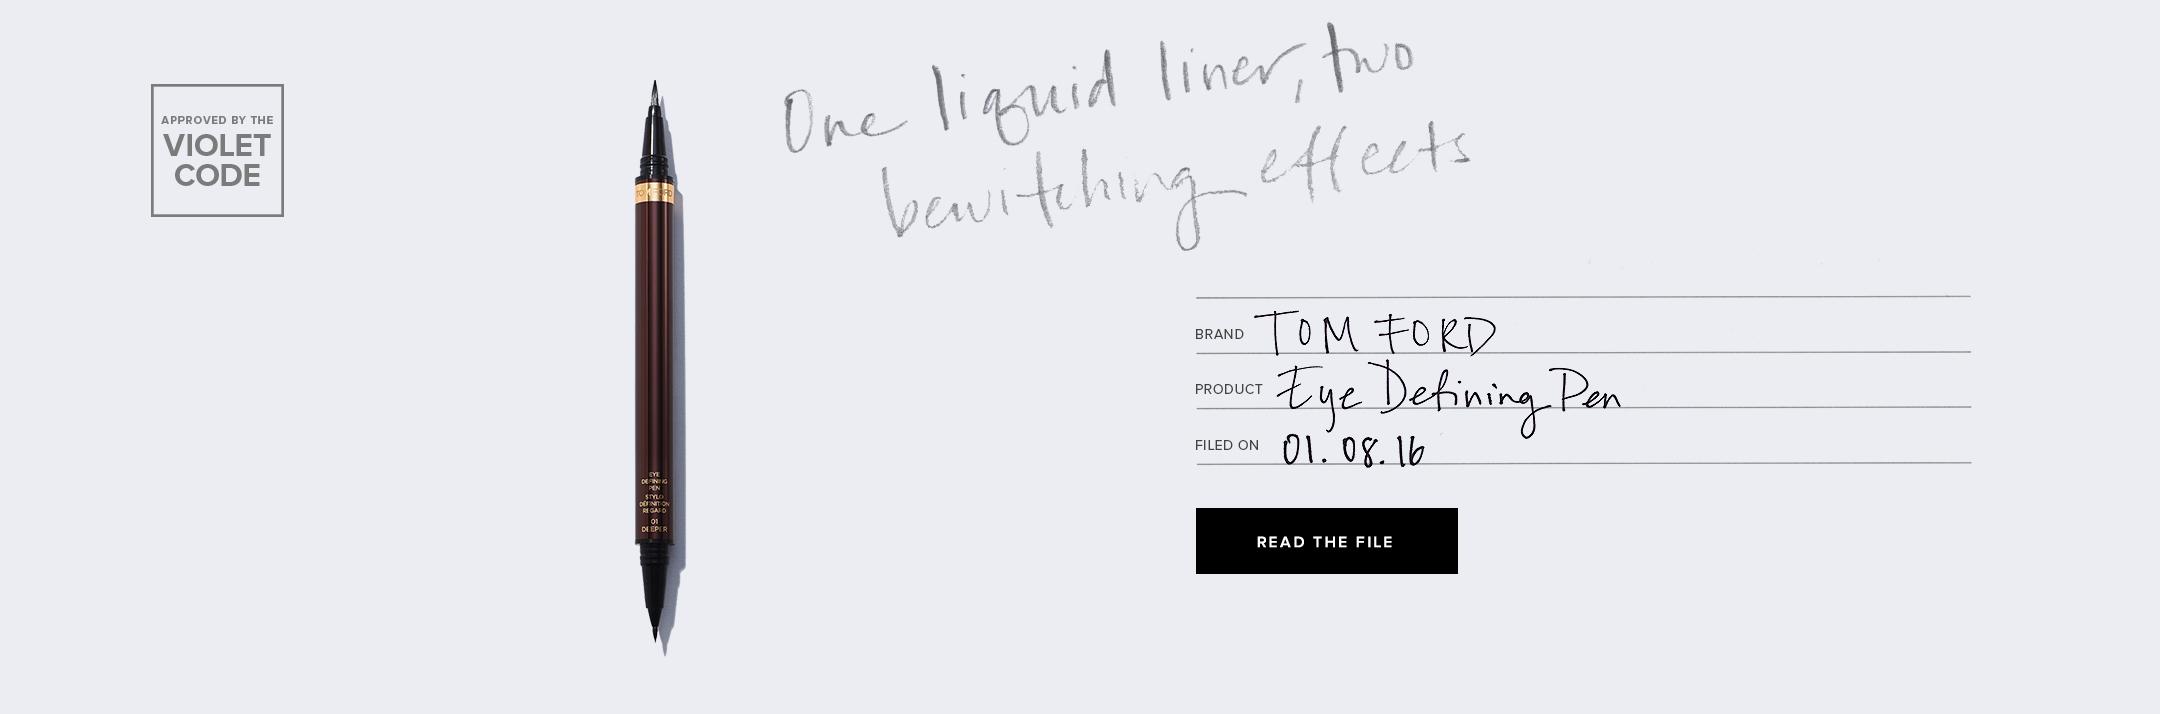 tom-ford-eye-defining-pen-interstitial.jpg